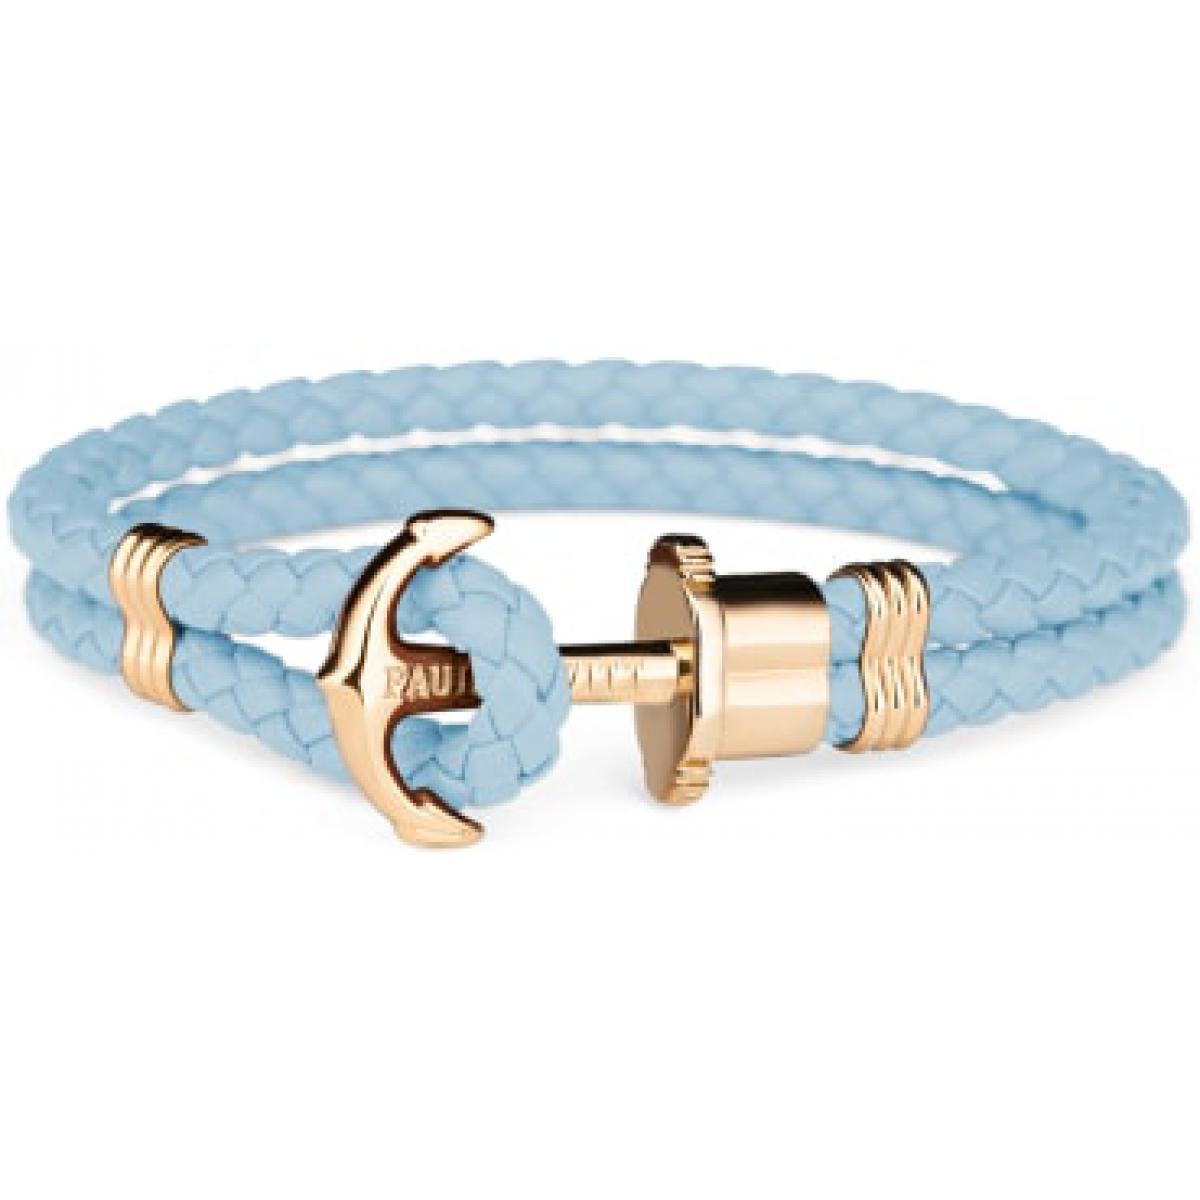 Bracelet Paul Hewitt PH-PH-L-G-NI - Bracelet Ancre Acier IP Doré / Cuir Niagara - Paul Hewitt Bijoux - Modalova